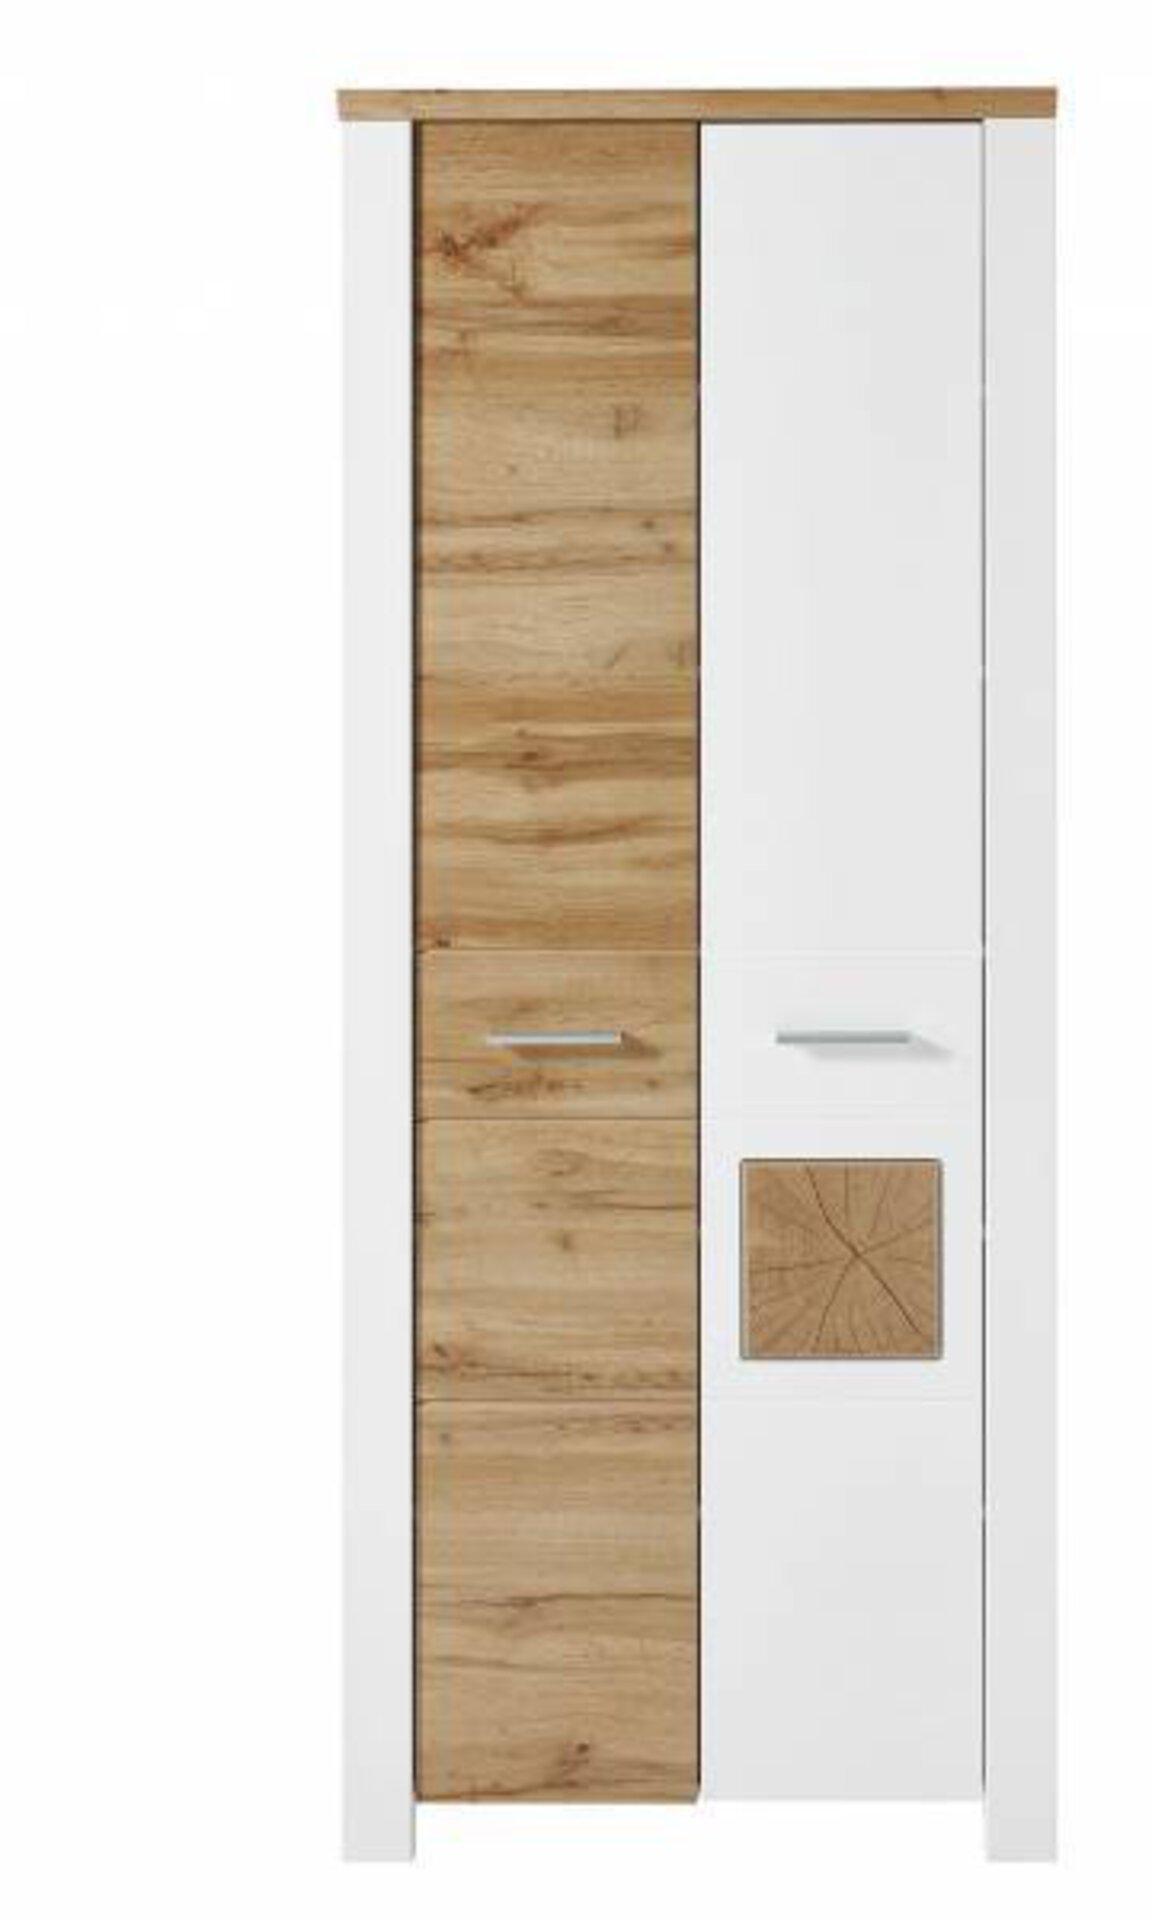 Garderobenschrank MATERIO Vito Holzwerkstoff mehrfarbig 39 x 200 x 80 cm